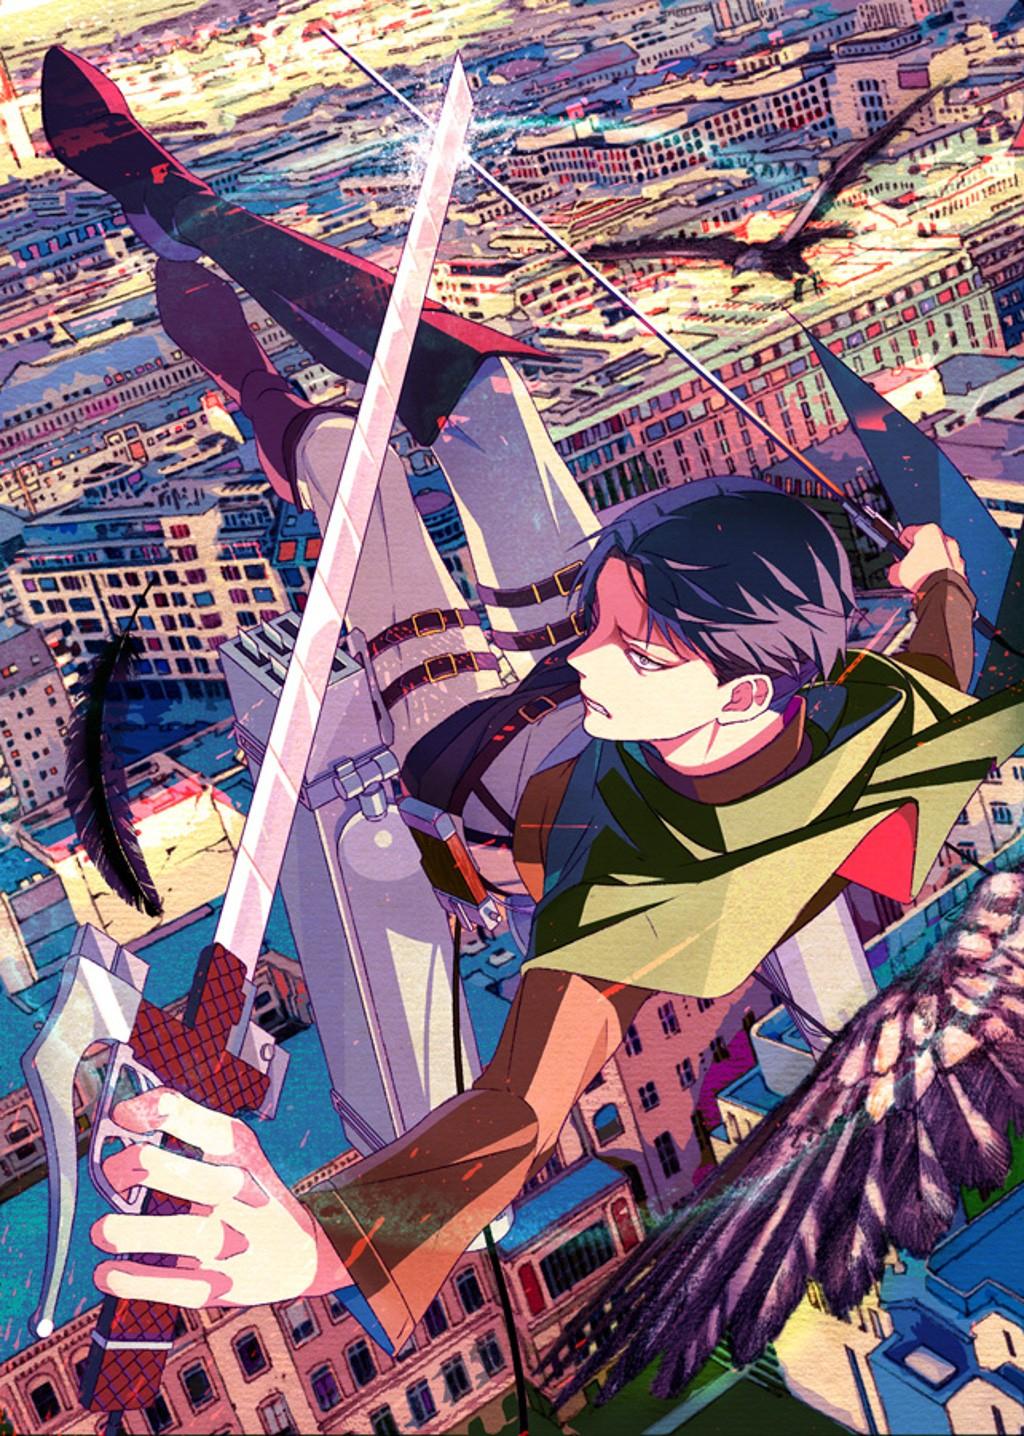 Wallpaper People Illustration City Anime Weapon Shingeki No Kyojin Comics Levi Ackerman Screenshot Comic Book 1024x1436 Microcosmos 50039 Hd Wallpapers Wallhere